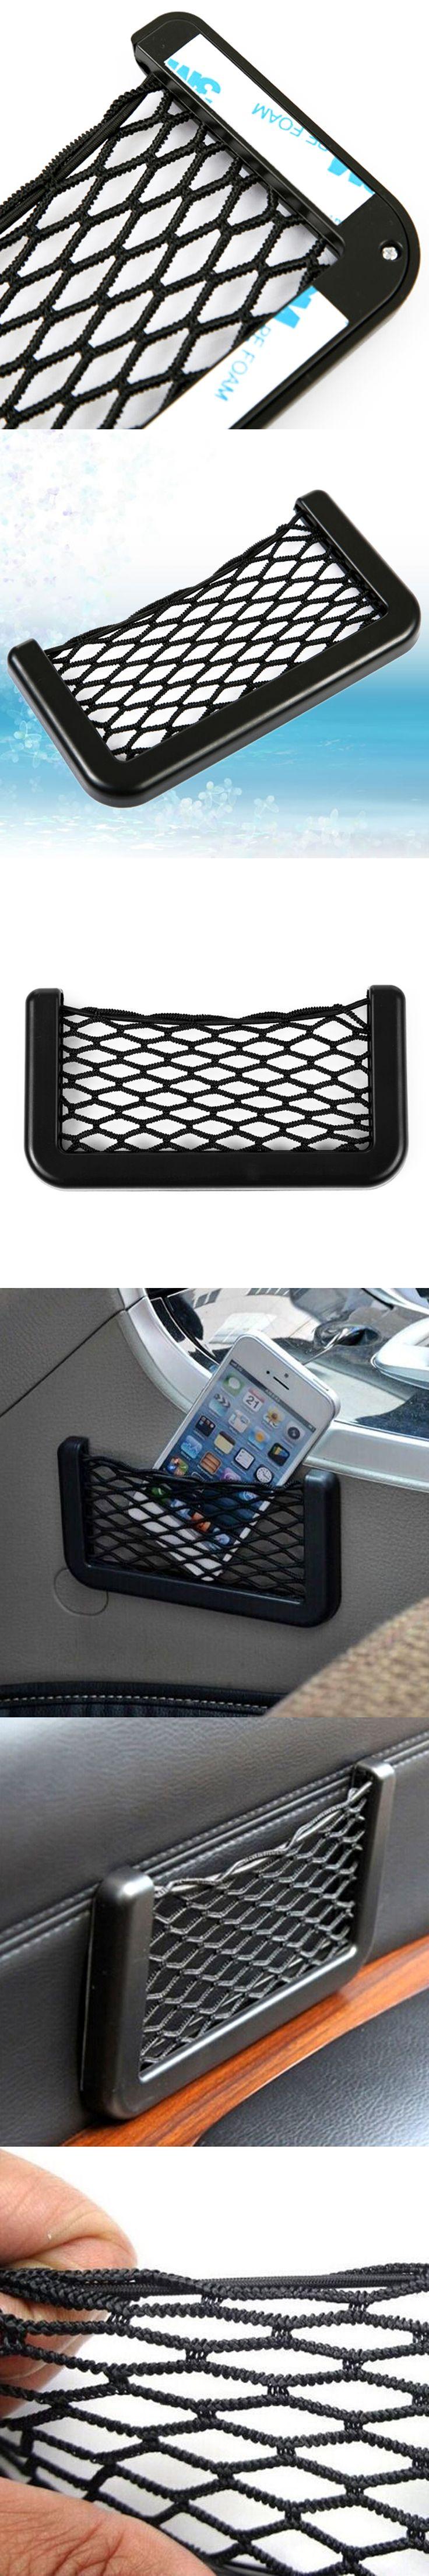 Dewtreetali Hotsale 14.5*8.5 cm Universal Auto Car Seat Back Storage Net Bag Phone Holder Pocket Organizer free shipping